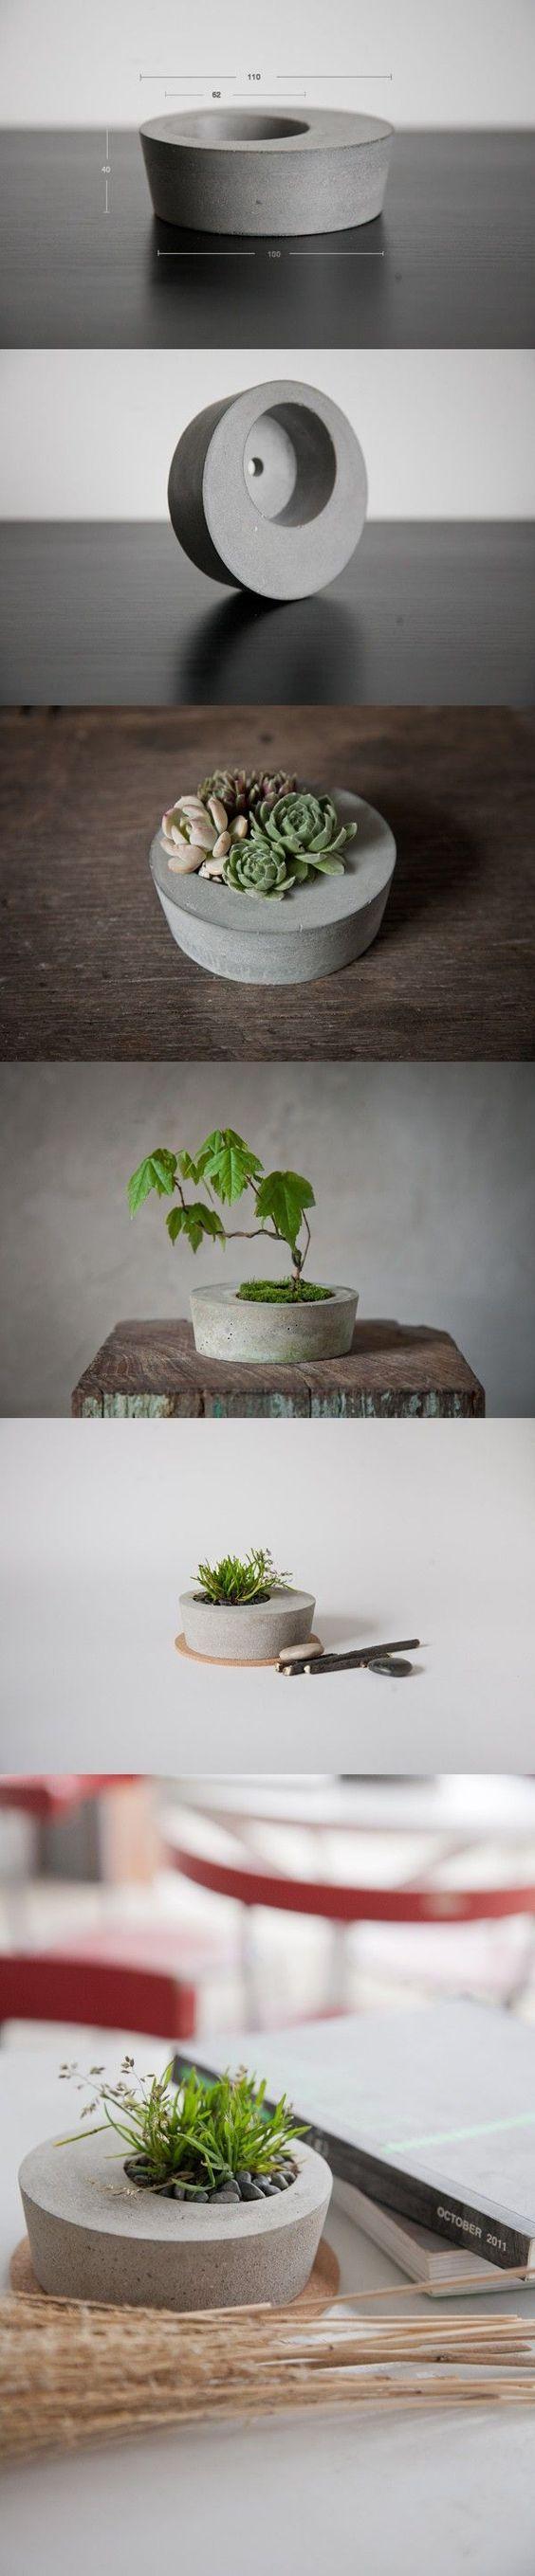 Wohndesign-artikel  best cemento objetos images on pinterest  cement bricolage and